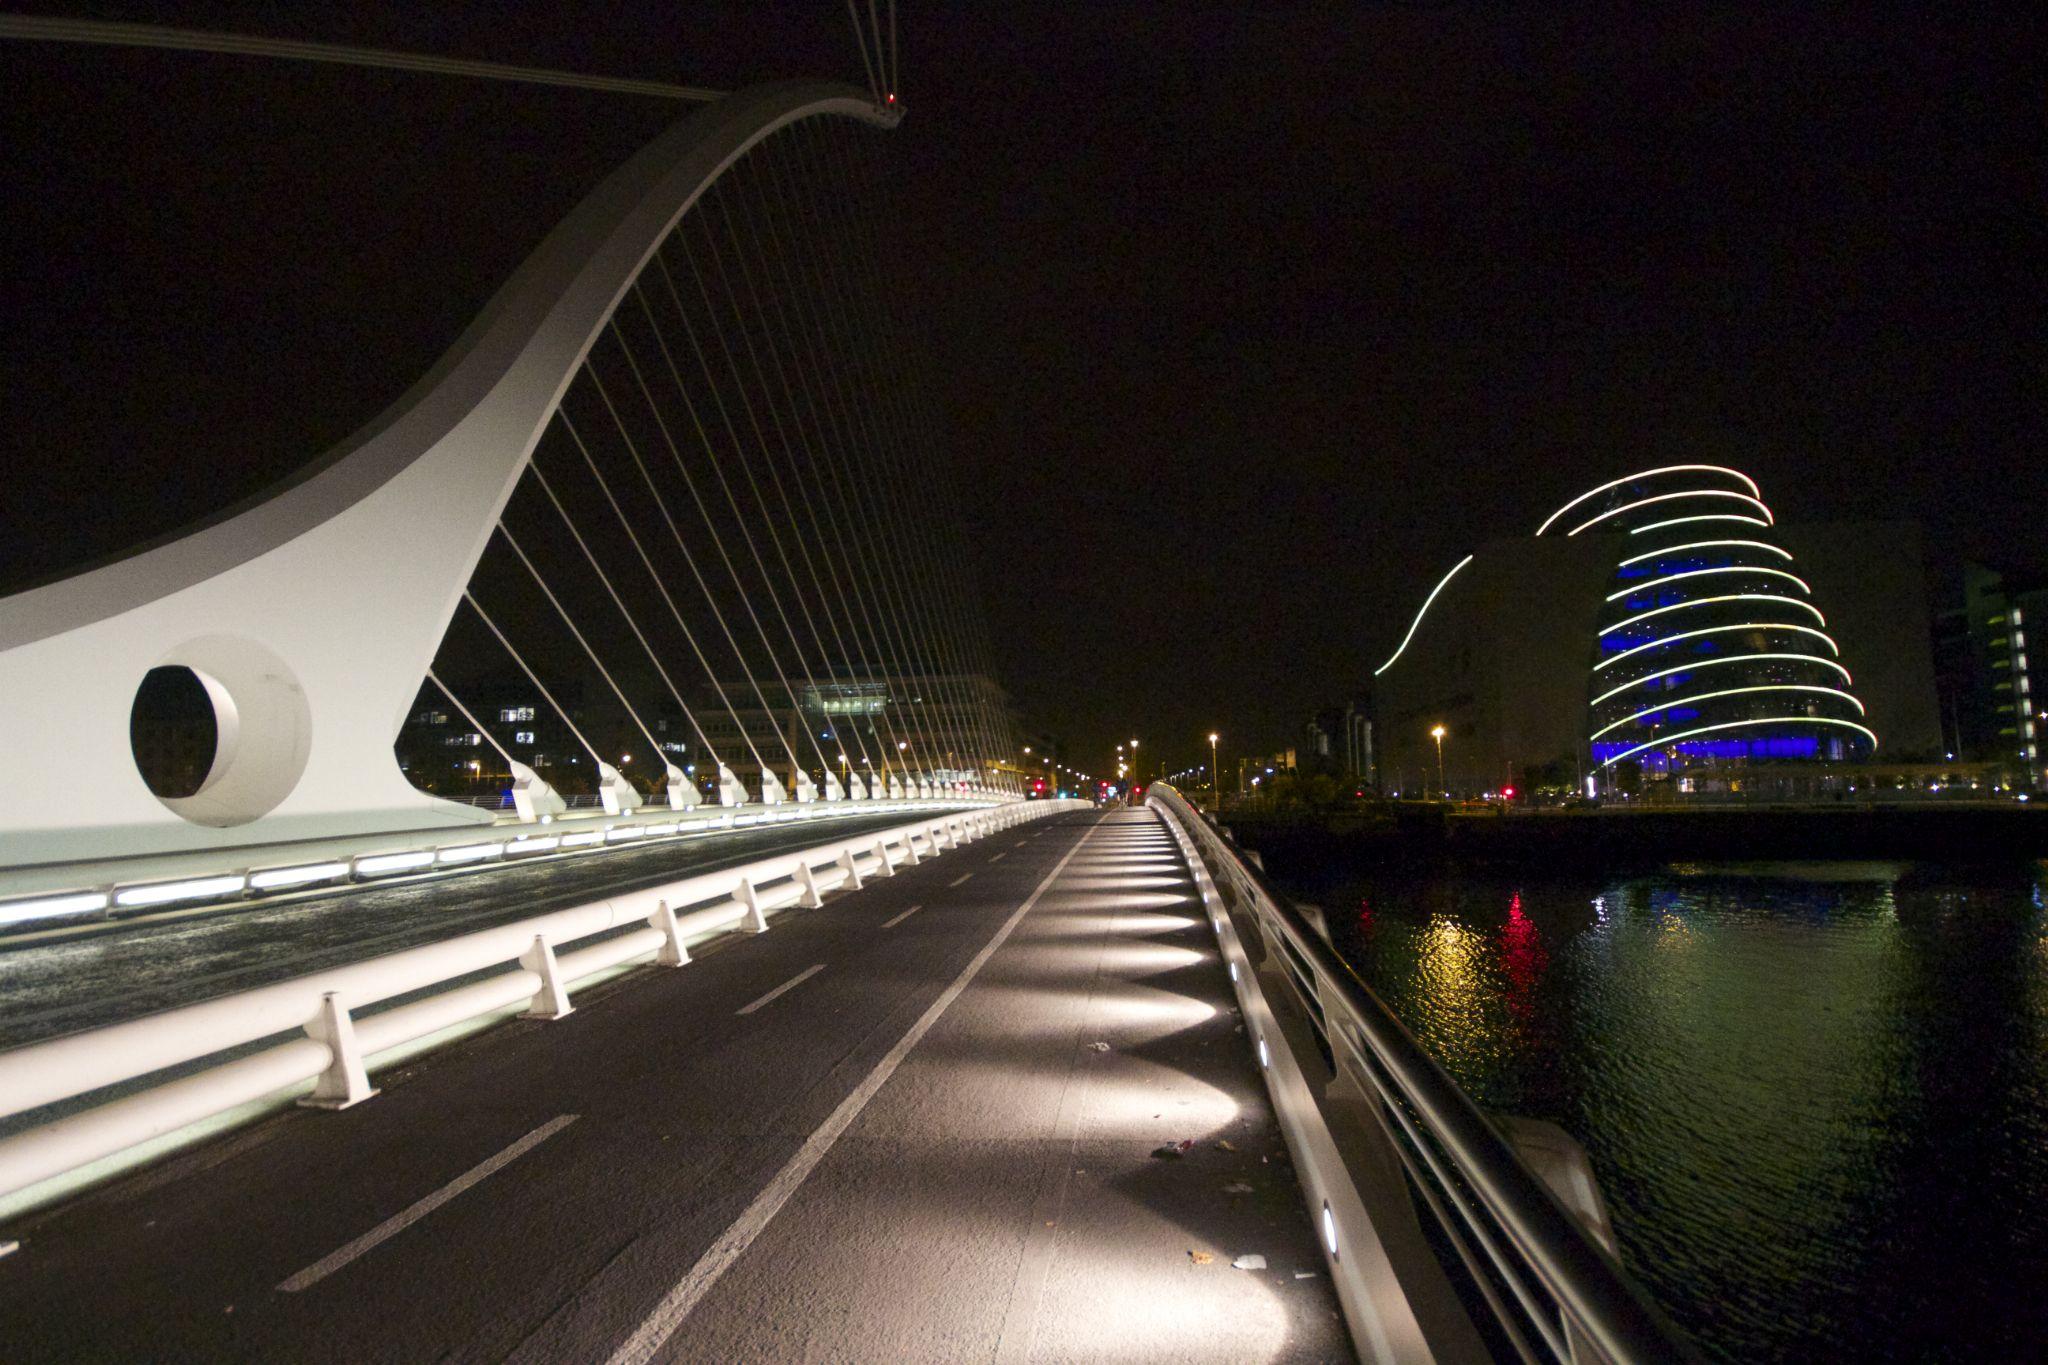 Samuel Beckett Bridge / Conference Centre  by Peter Purdue